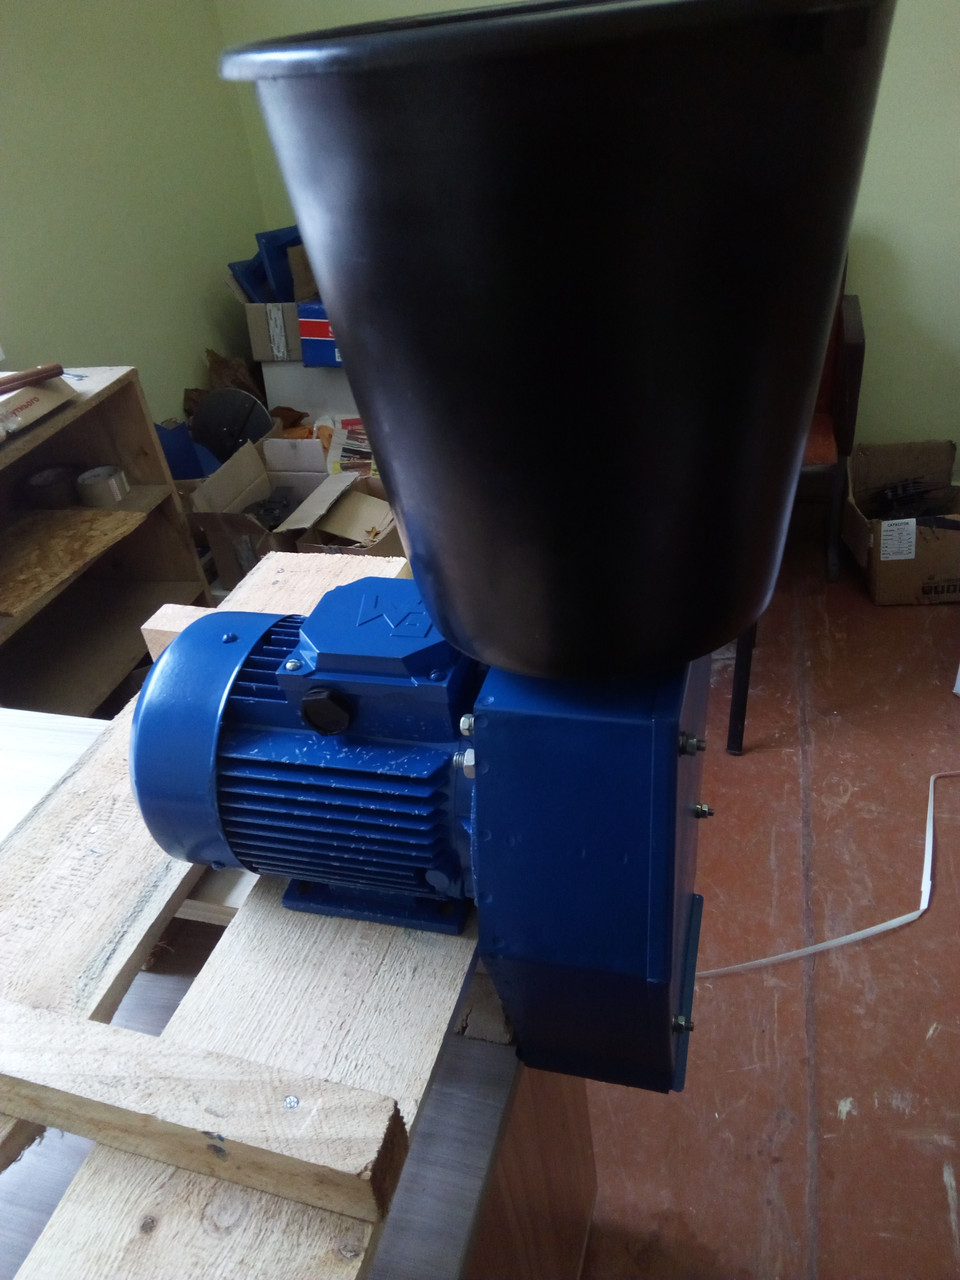 Зернодробилка Эликор 3 до 350кг зерна в час на 380В